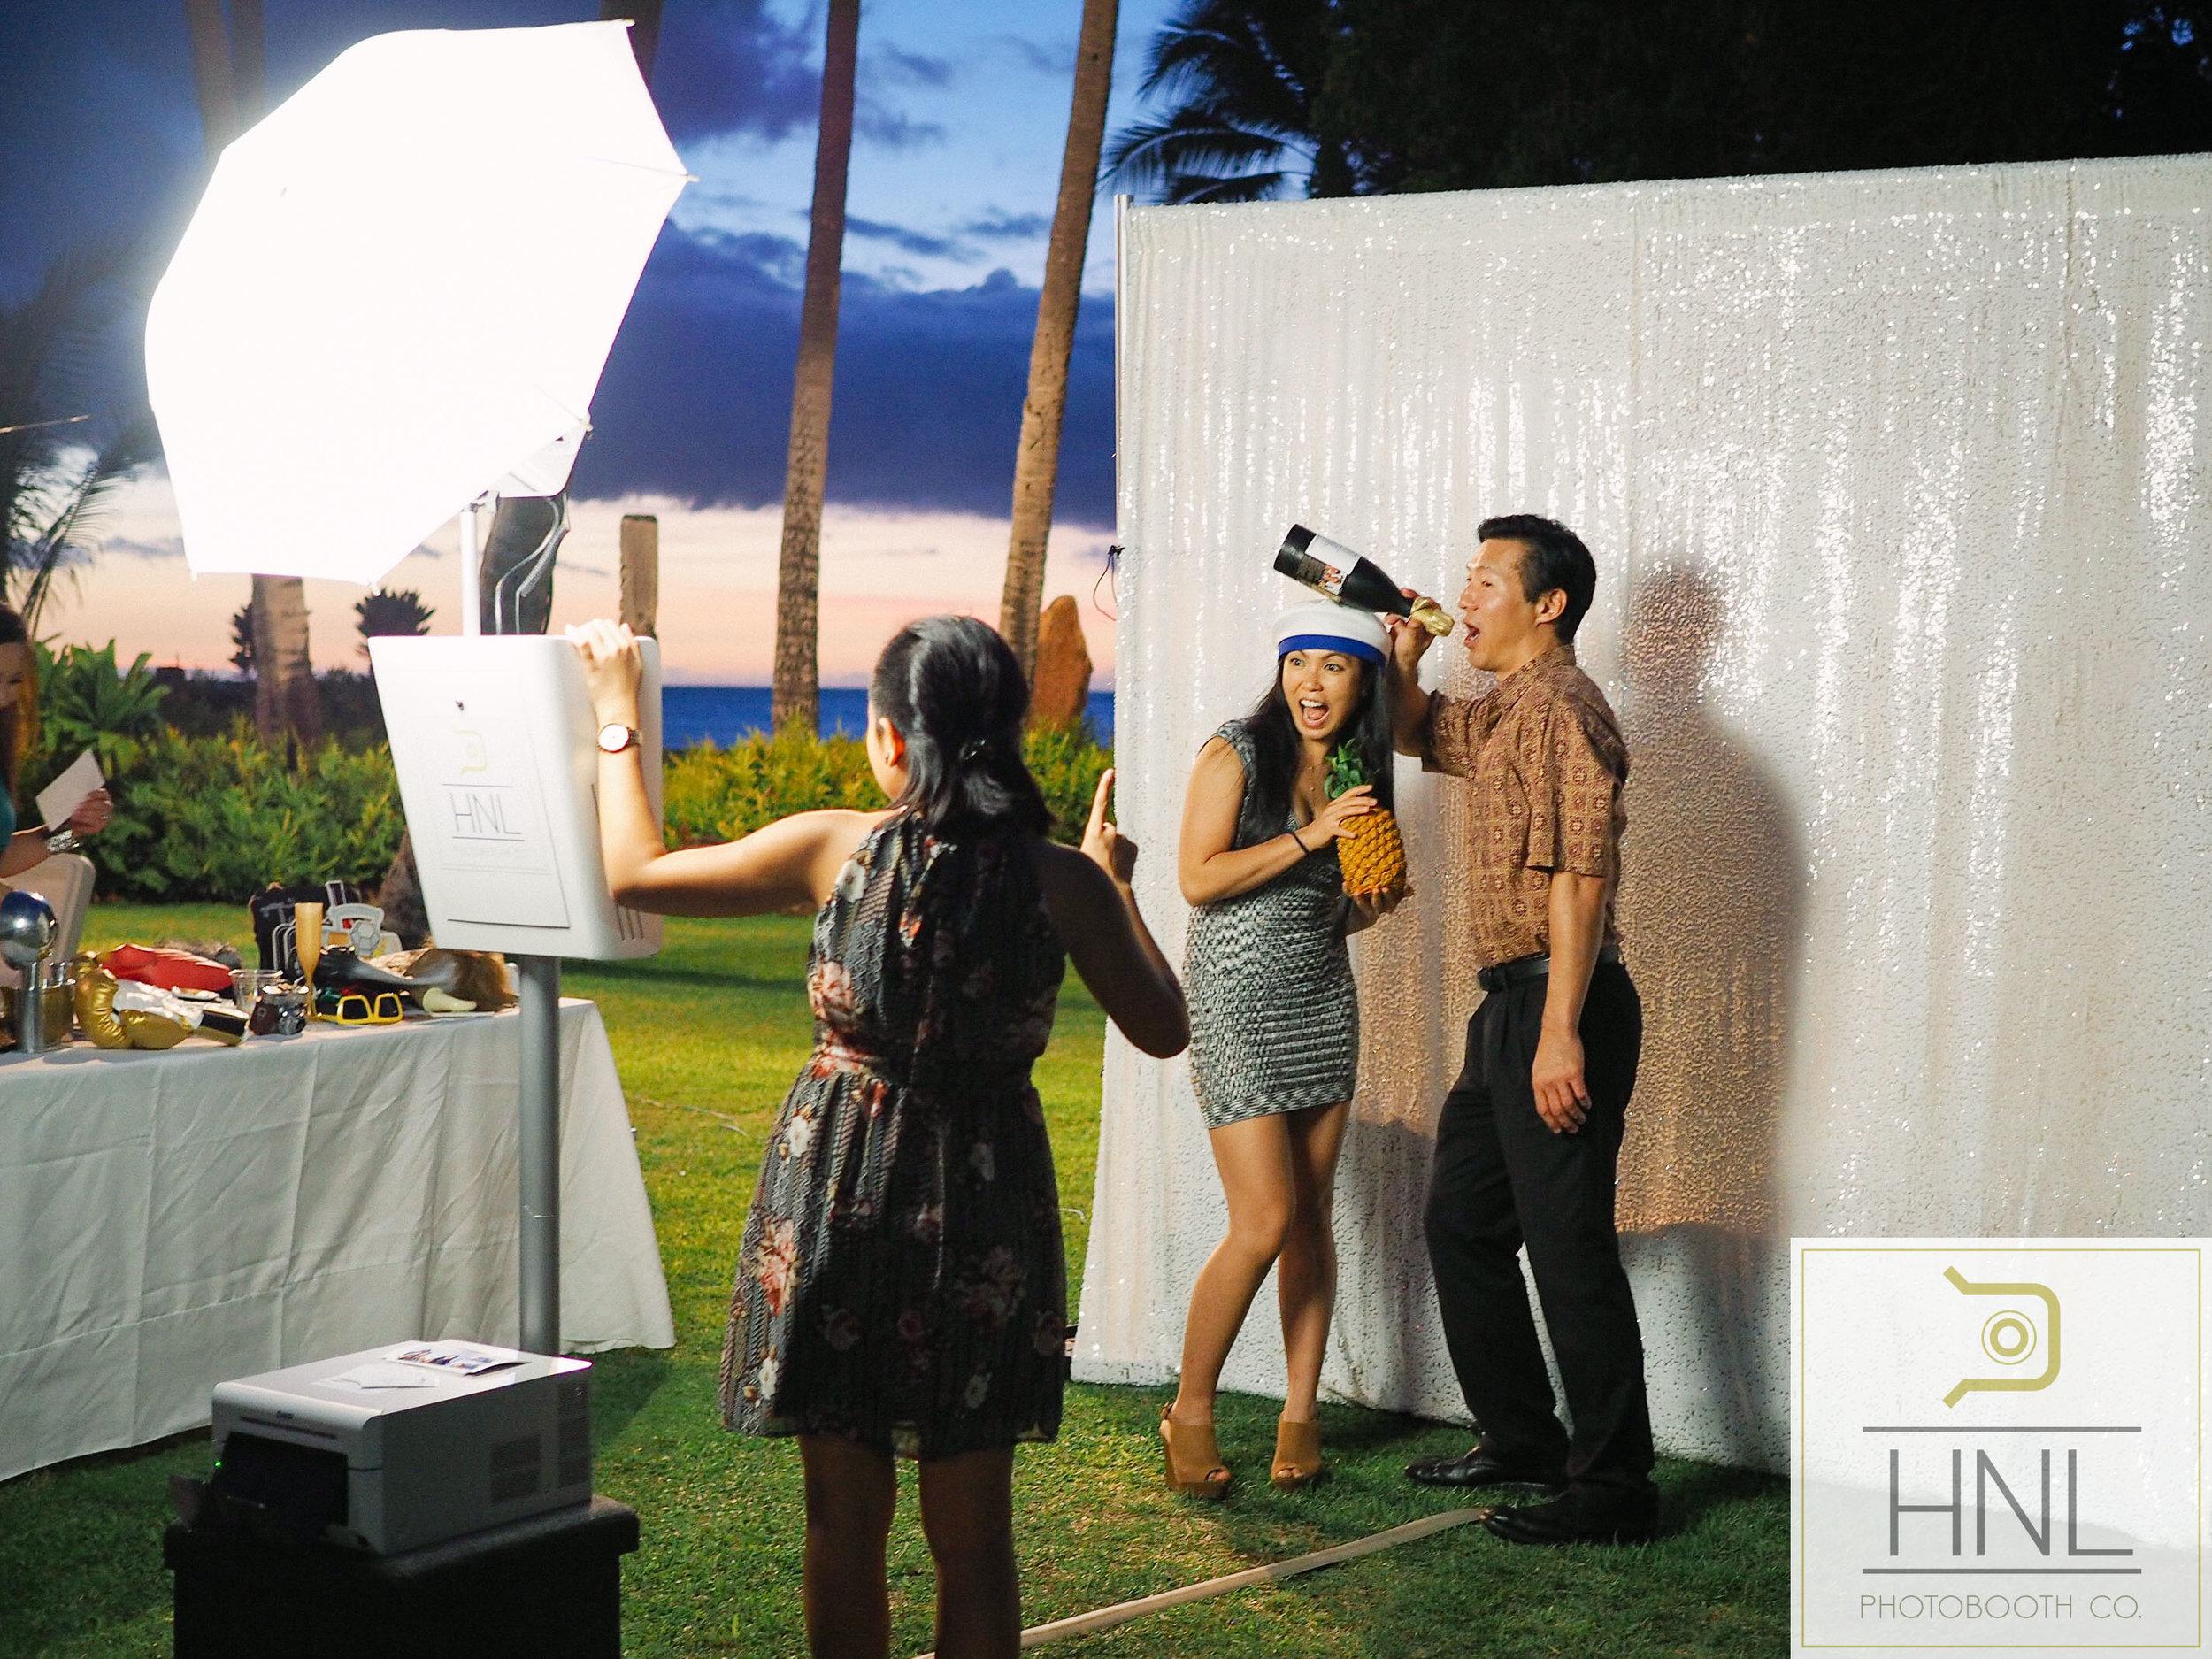 Miki and Dan wedding photo booth lanikohonua ko olina kapolei Oahu Hawaii -53.jpg